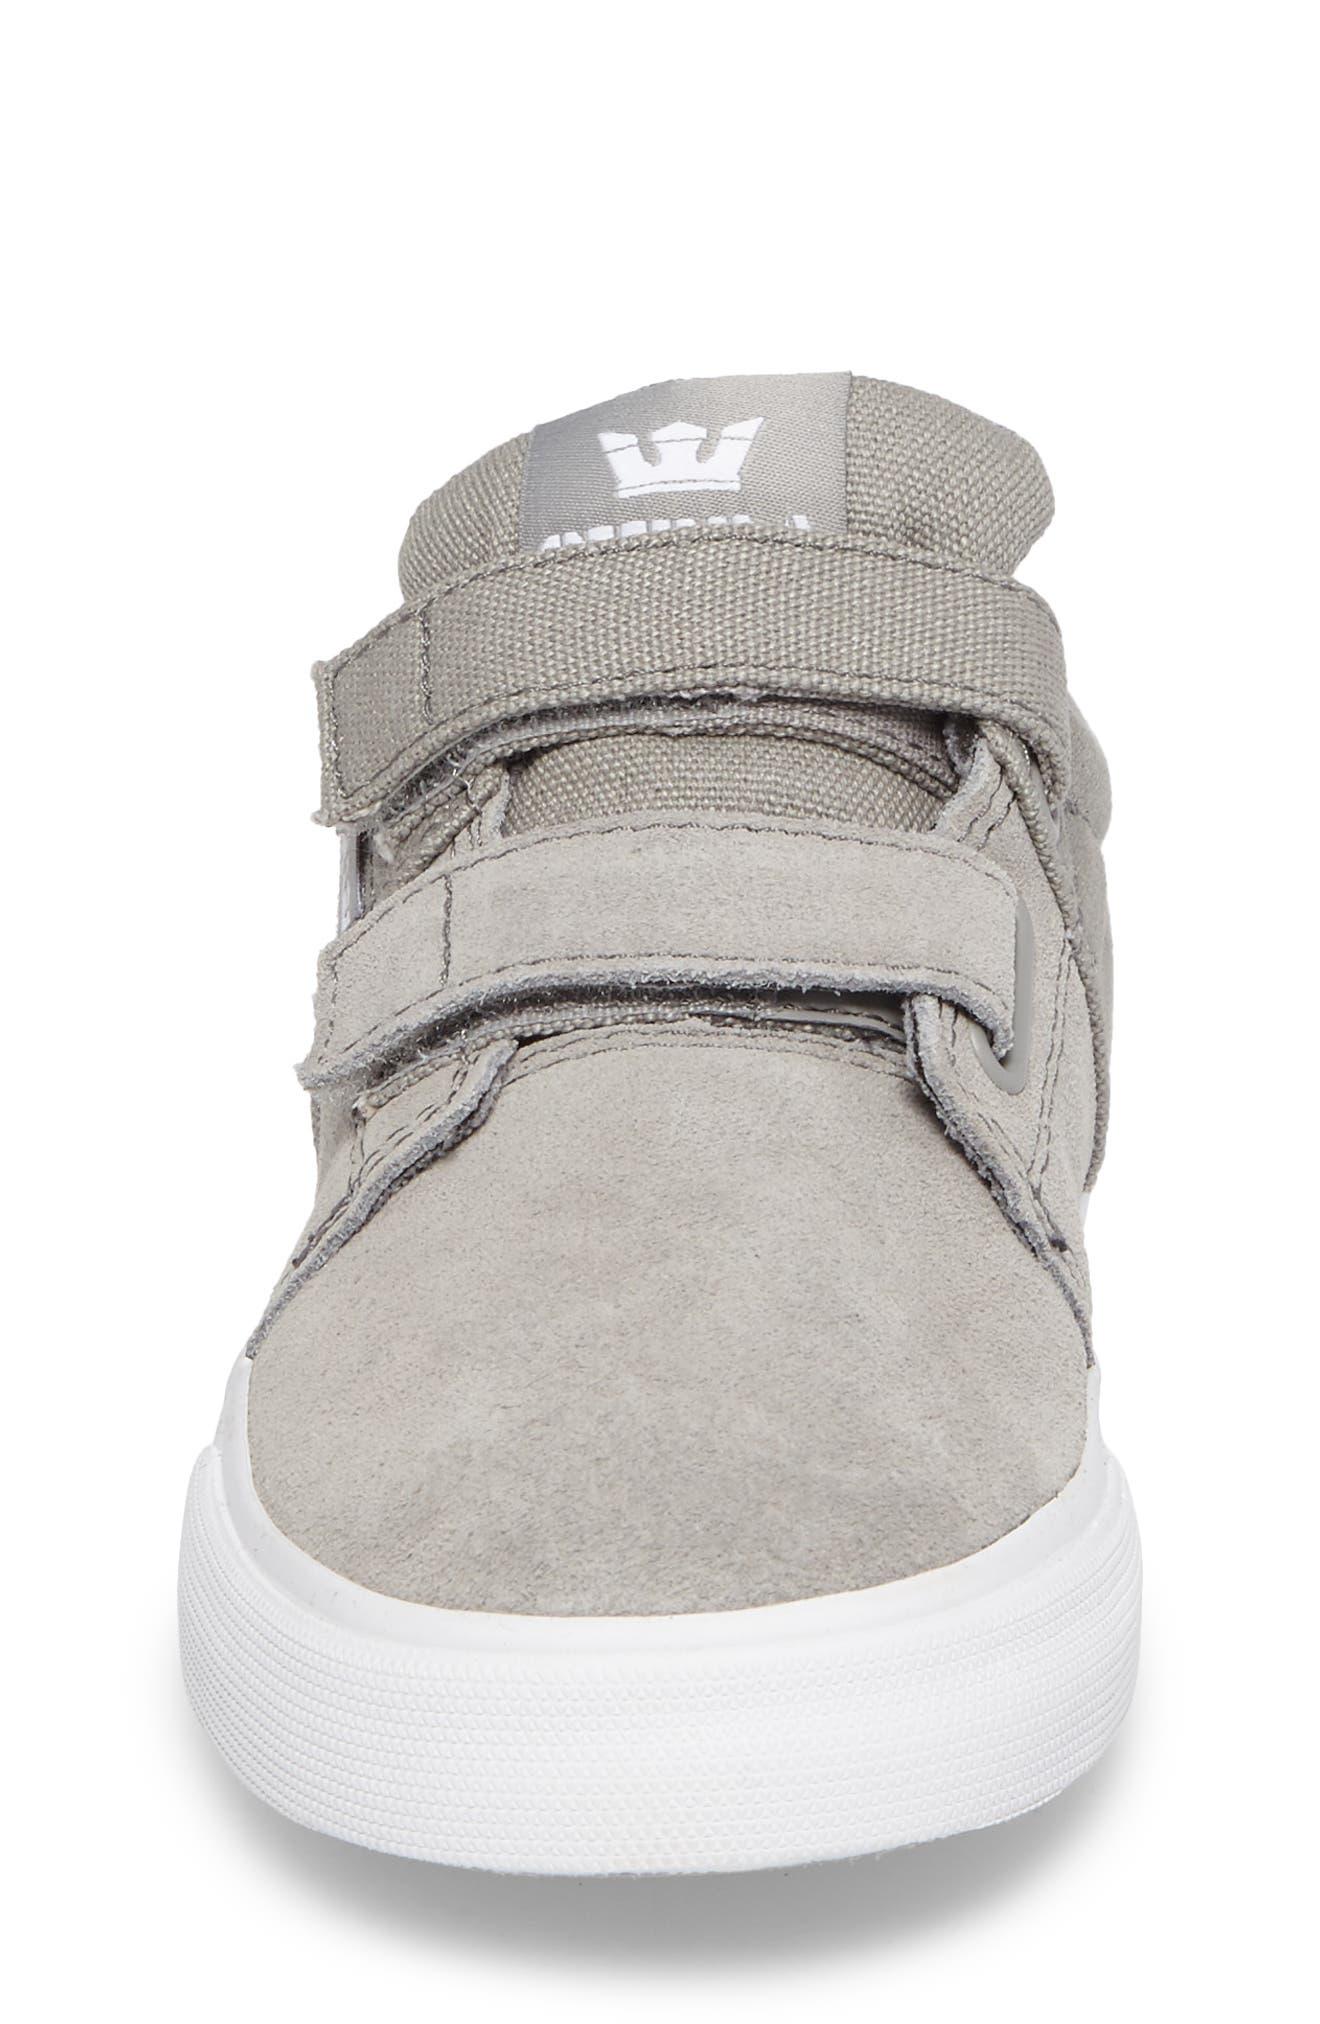 Alternate Image 4  - Supra Stacks Low Top Sneaker (Toddler, Little Kid & Big Kid)